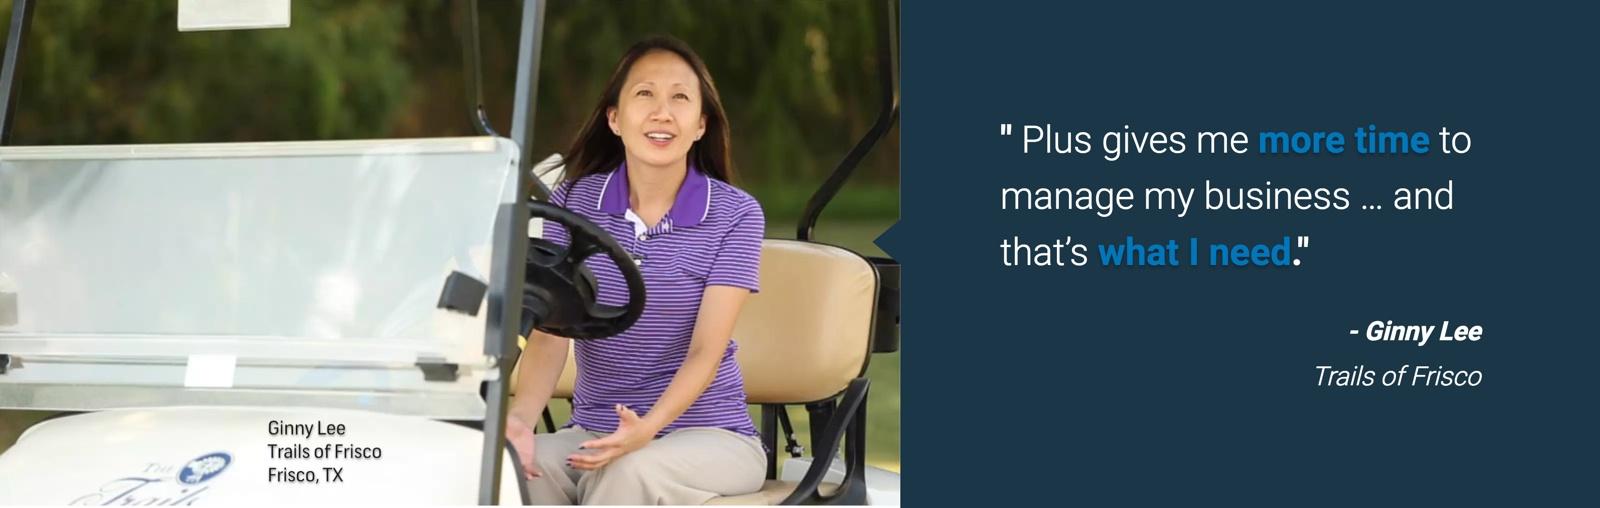 golfnow-marketing-plus